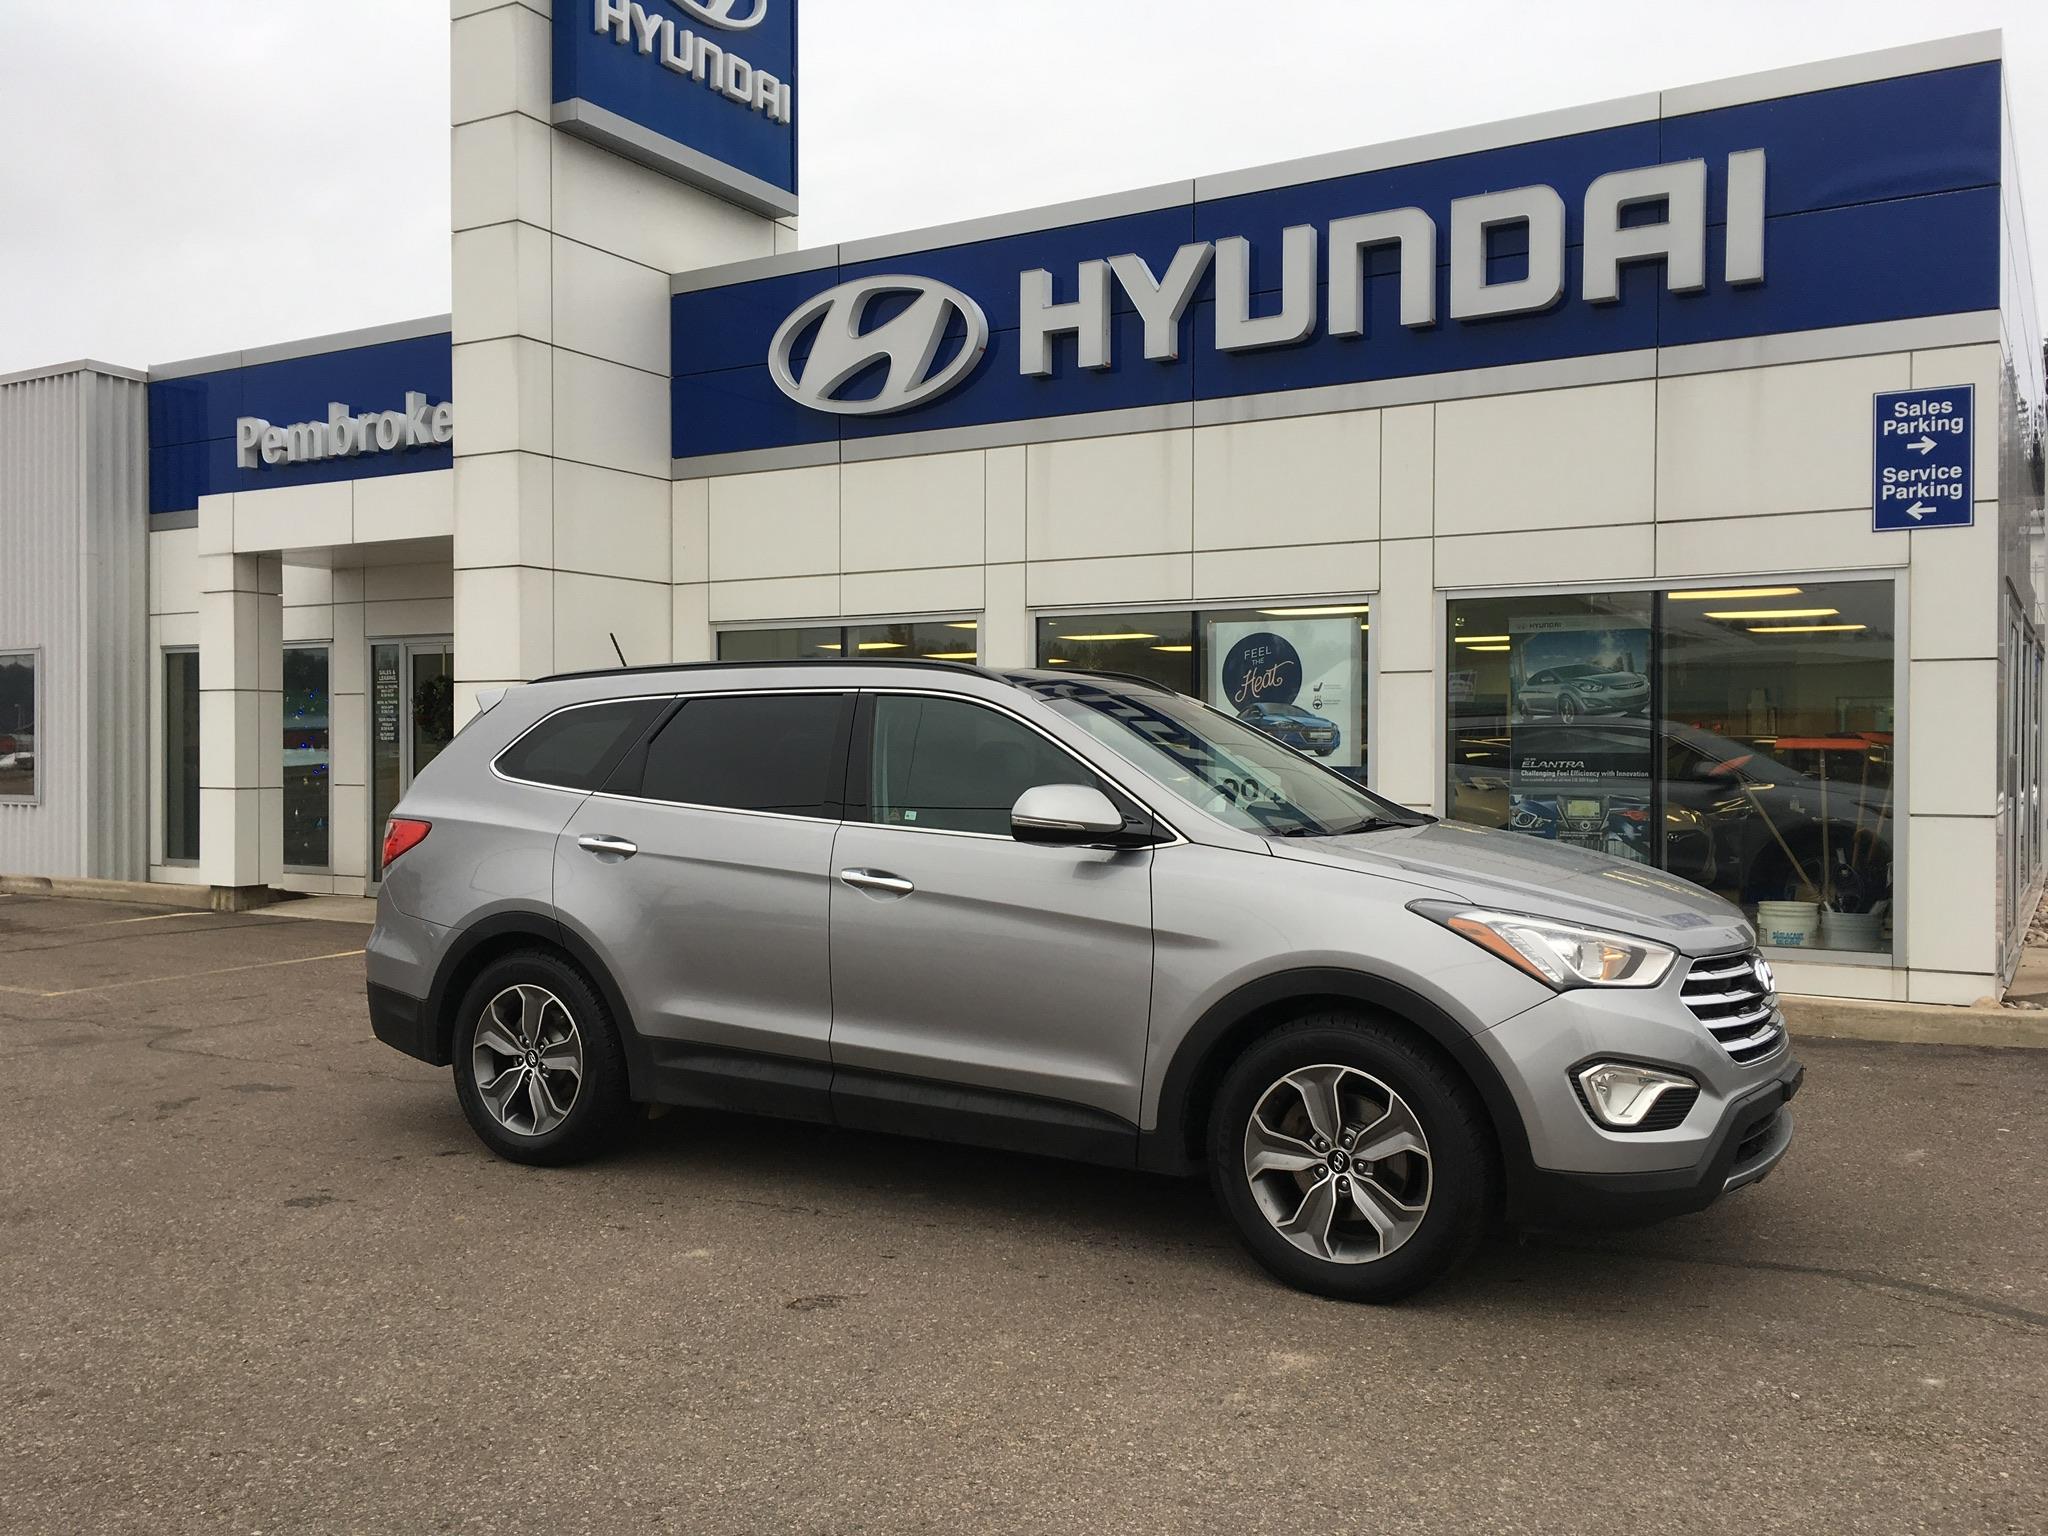 2013 Hyundai Santa Fe XL Luxury (Stk: 17518-1) in Pembroke - Image 1 of 1